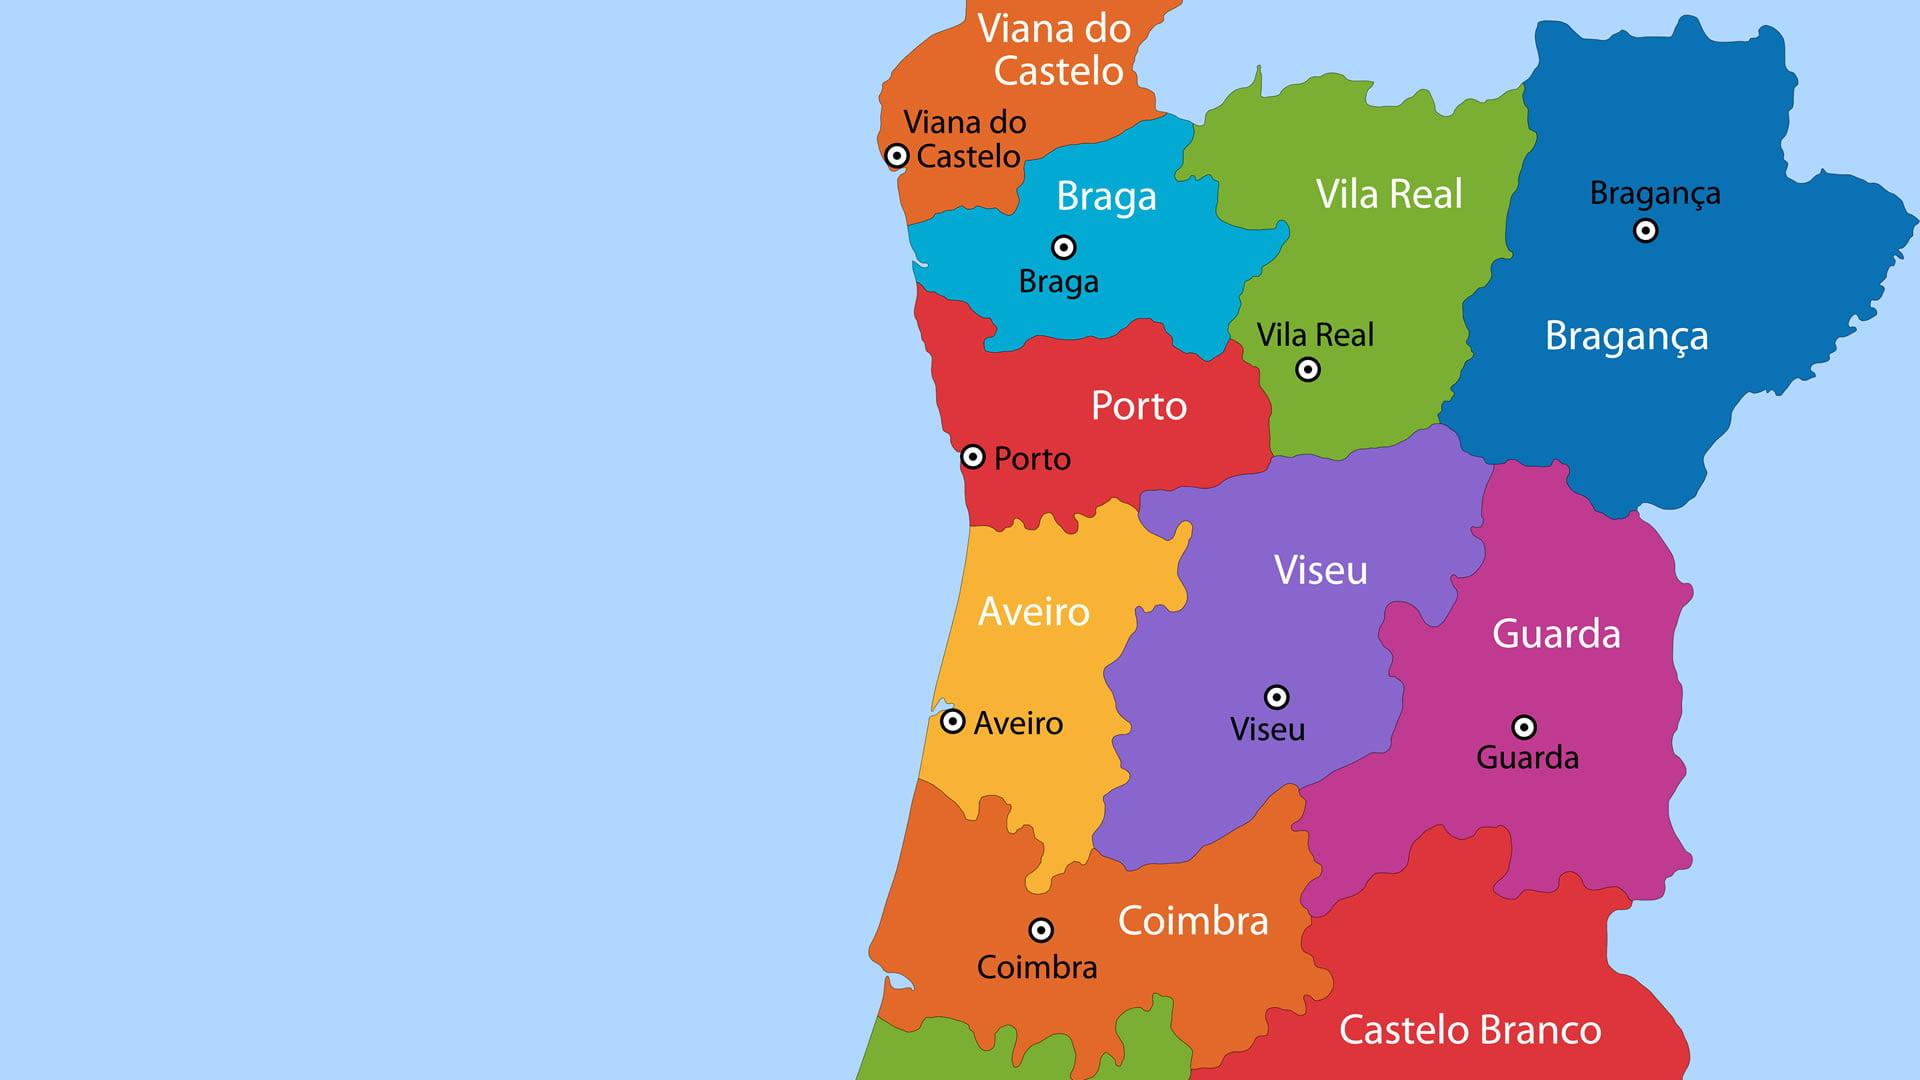 mapa de portugal hd Mapa político de Portugal: zona norte mapa de portugal hd